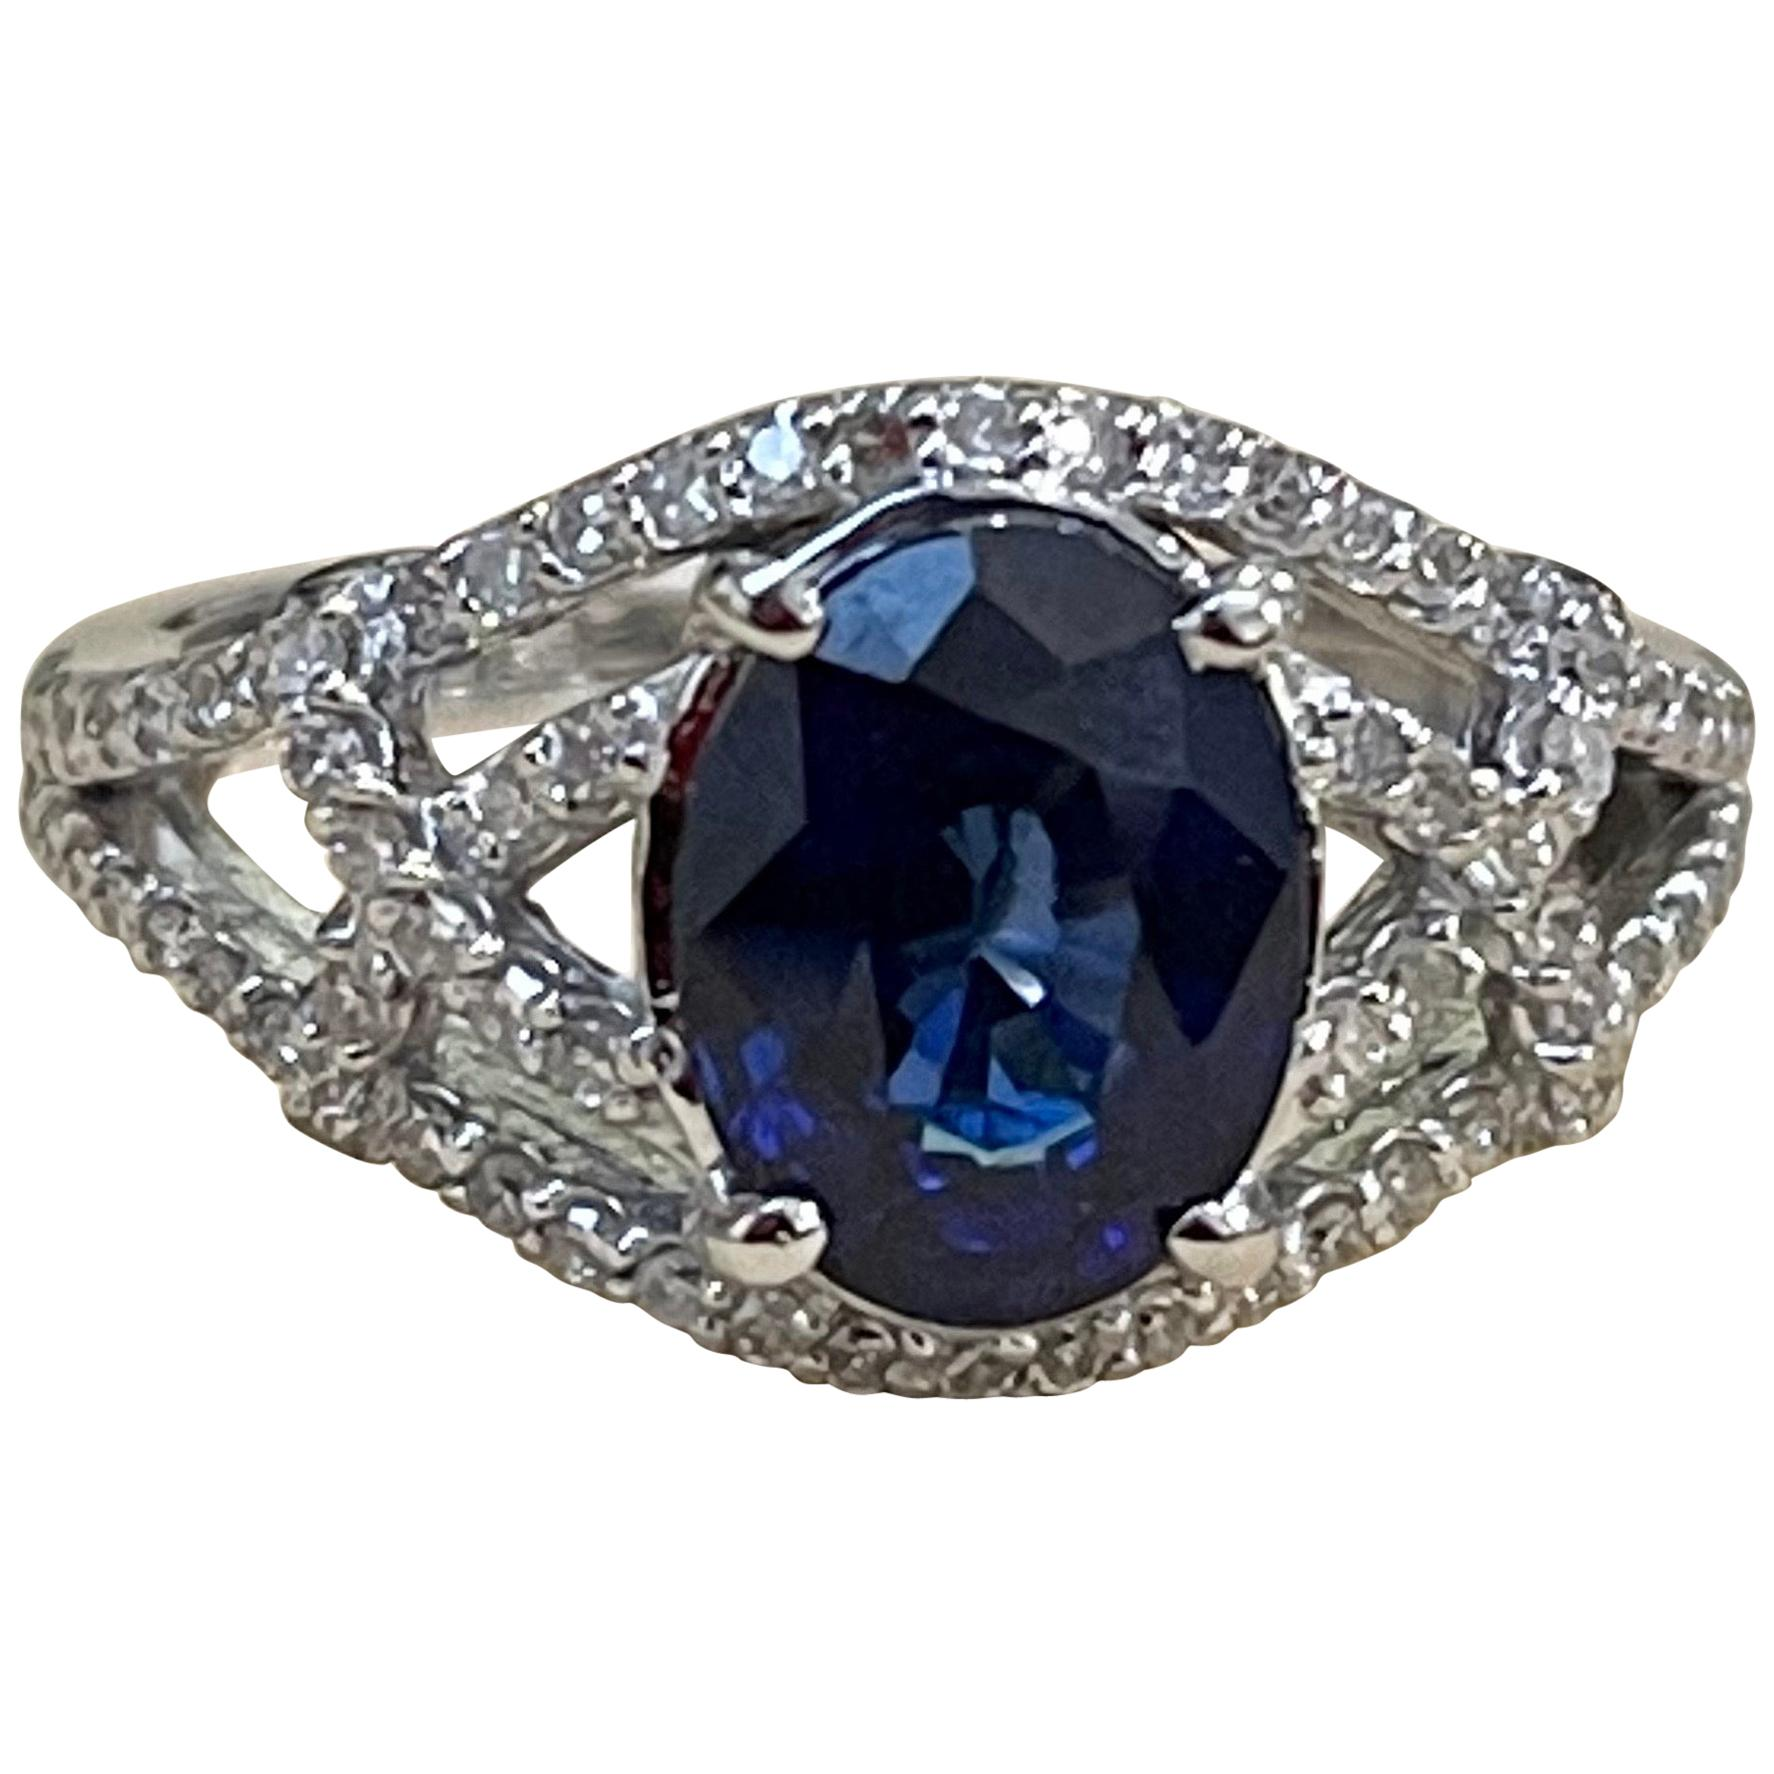 Effy's 1.9Ct Blue Sapphire & 0.36Ct Diamond Cocktail Ring in 14 Karat White Gold